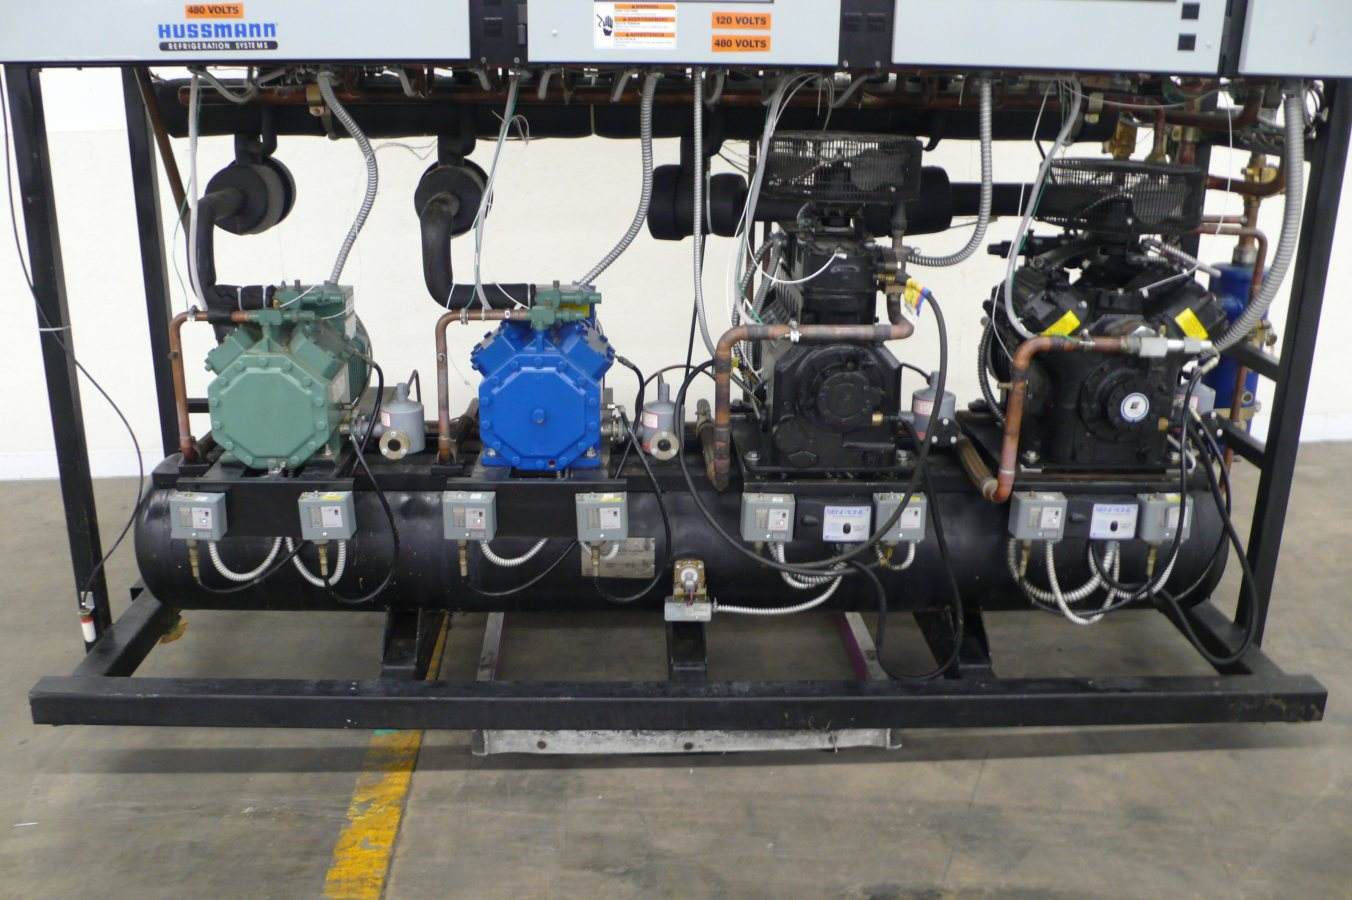 copeland discus wiring diagram triumph street triple 675 hussmann 30 hp low temp freezer refrigeration rack